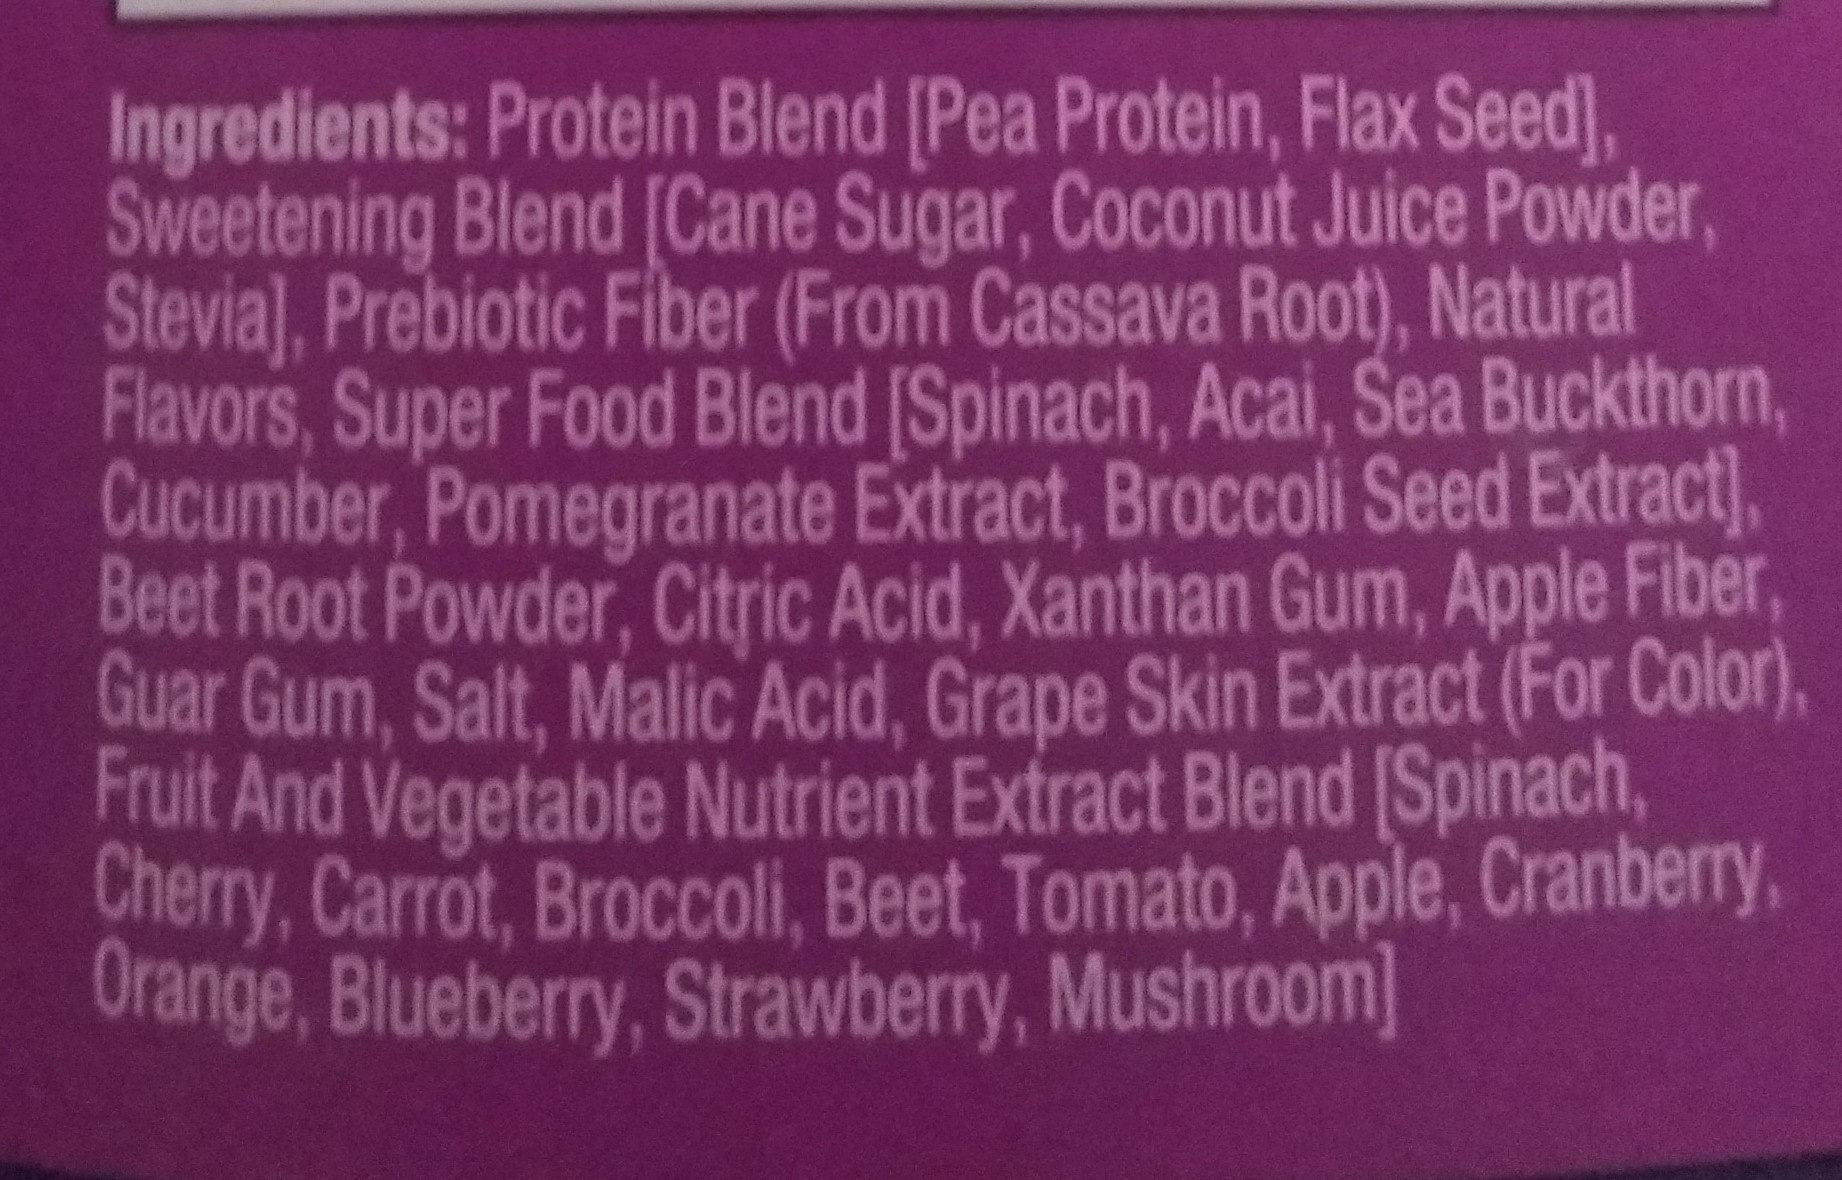 Super foods protein smoothoe - Ingredients - en